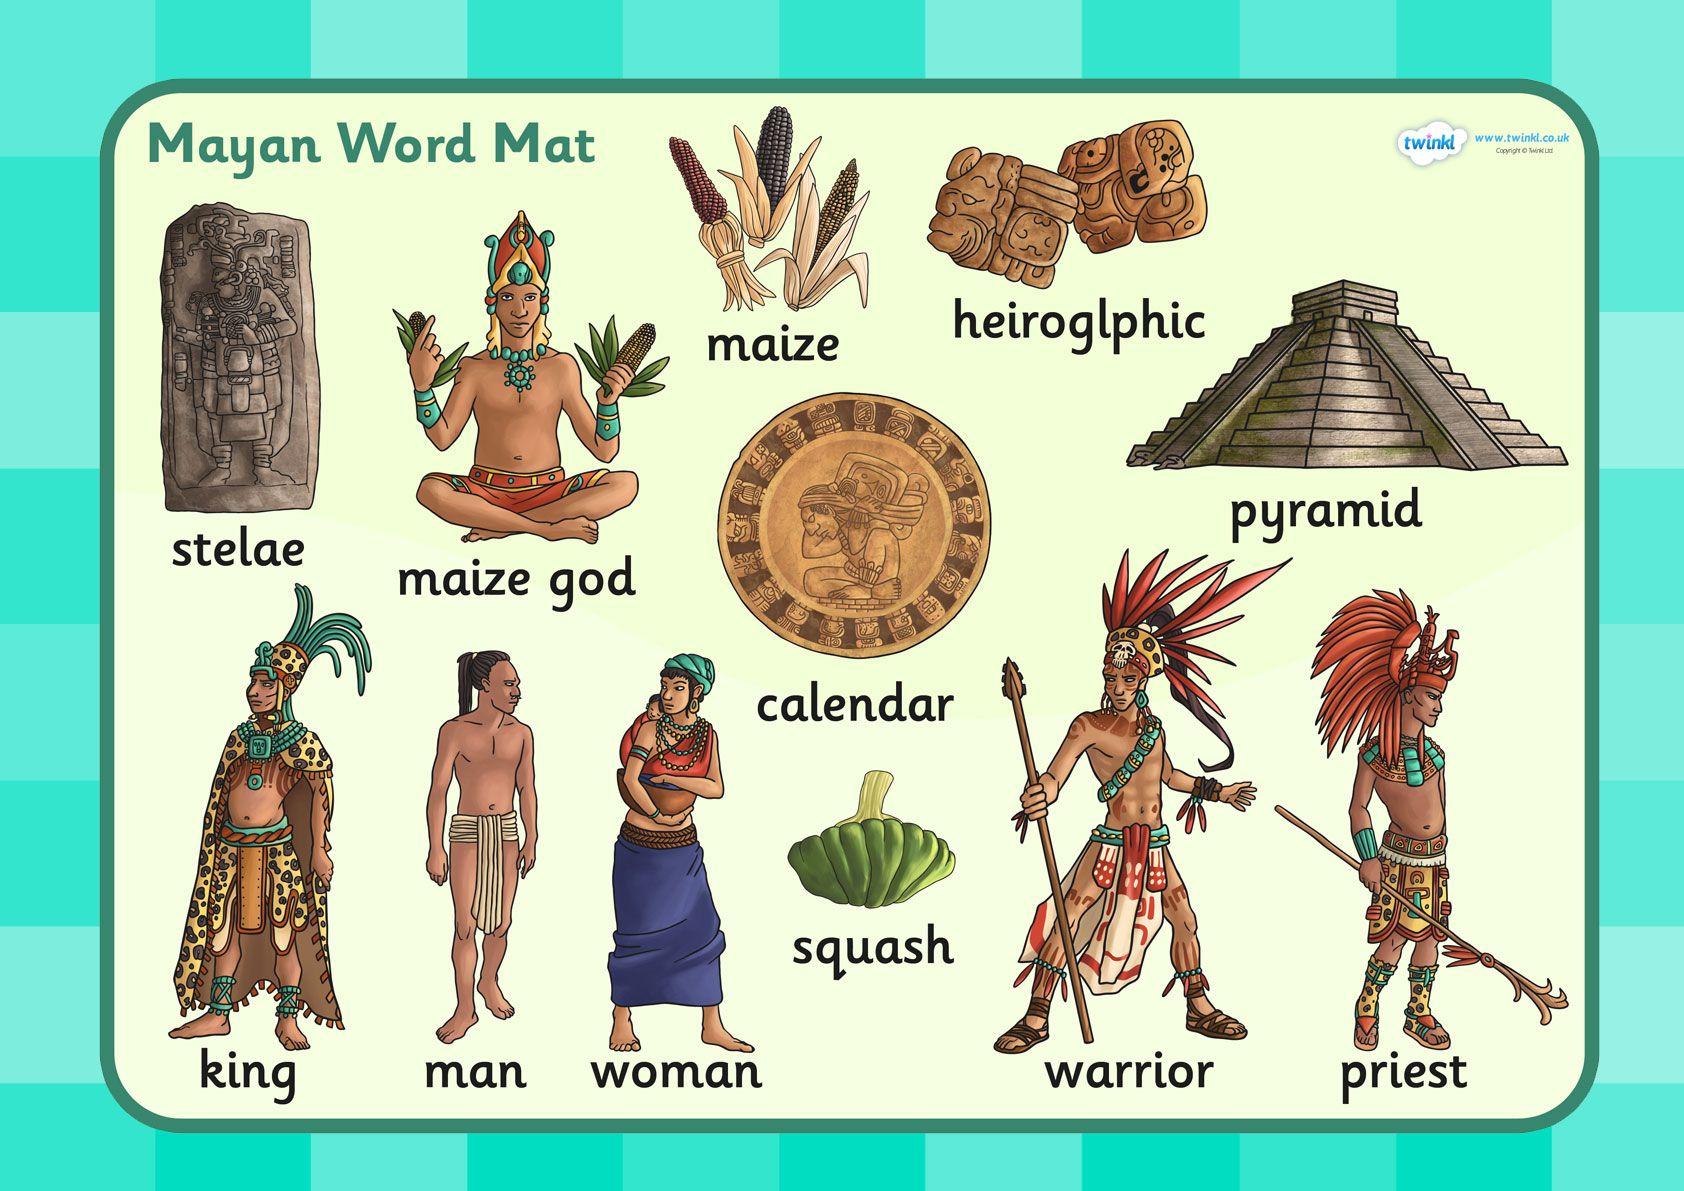 worksheet Mayan Worksheets For Kids ks2 mayan civilization word mat historical study mat